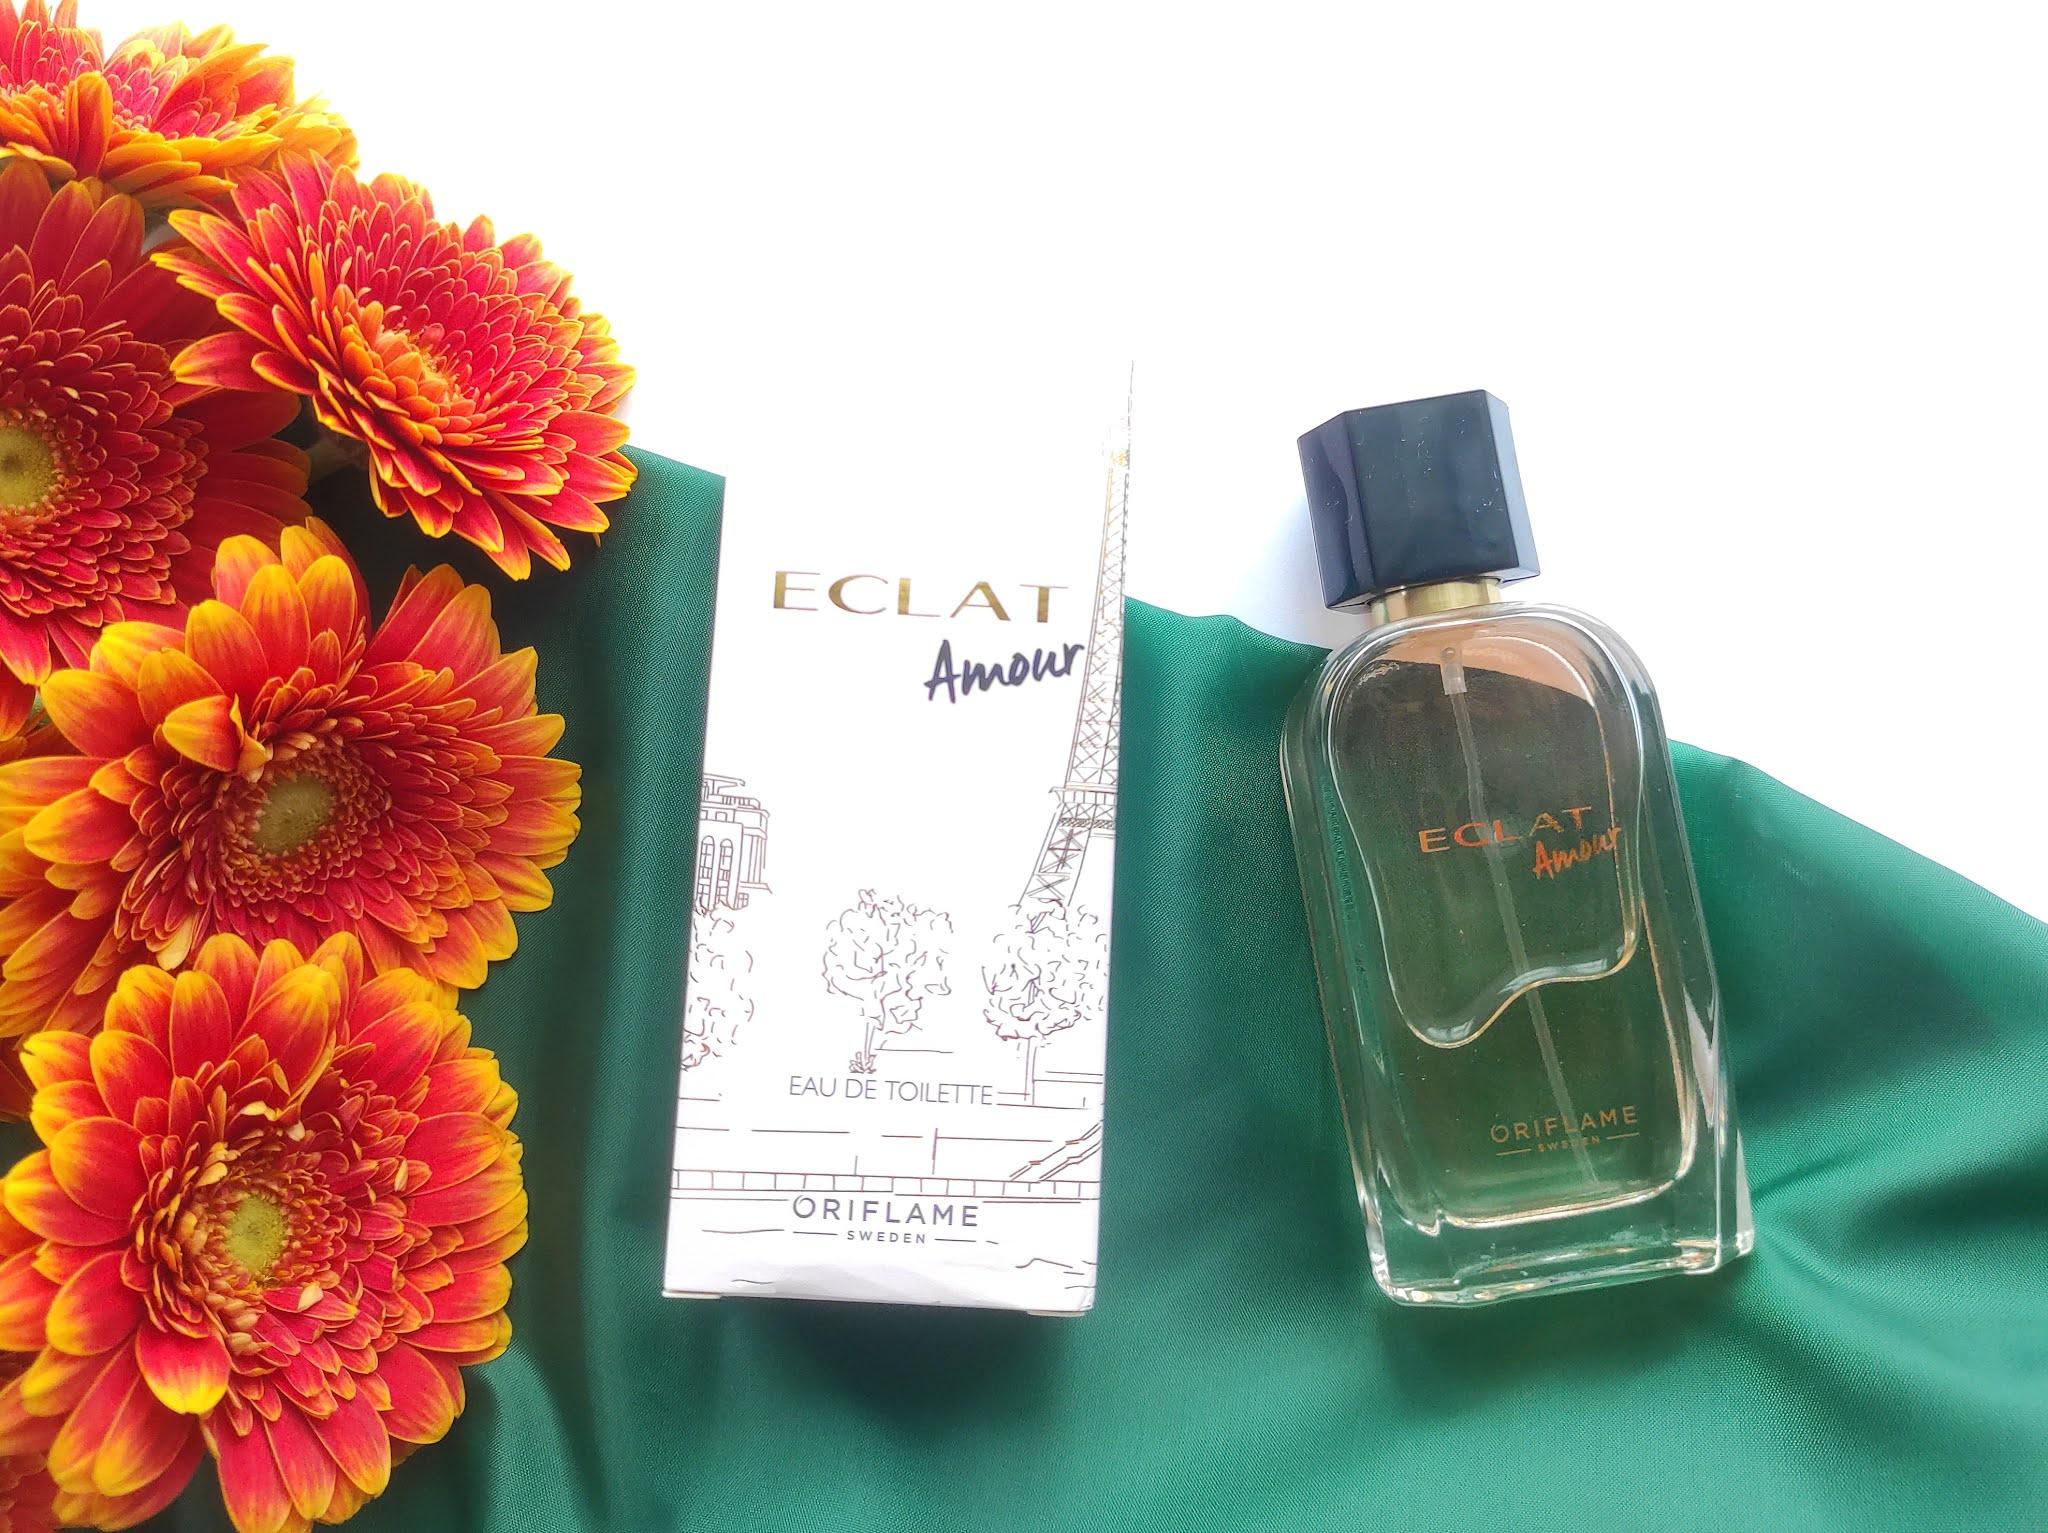 Eclat Amour recenzja perfum